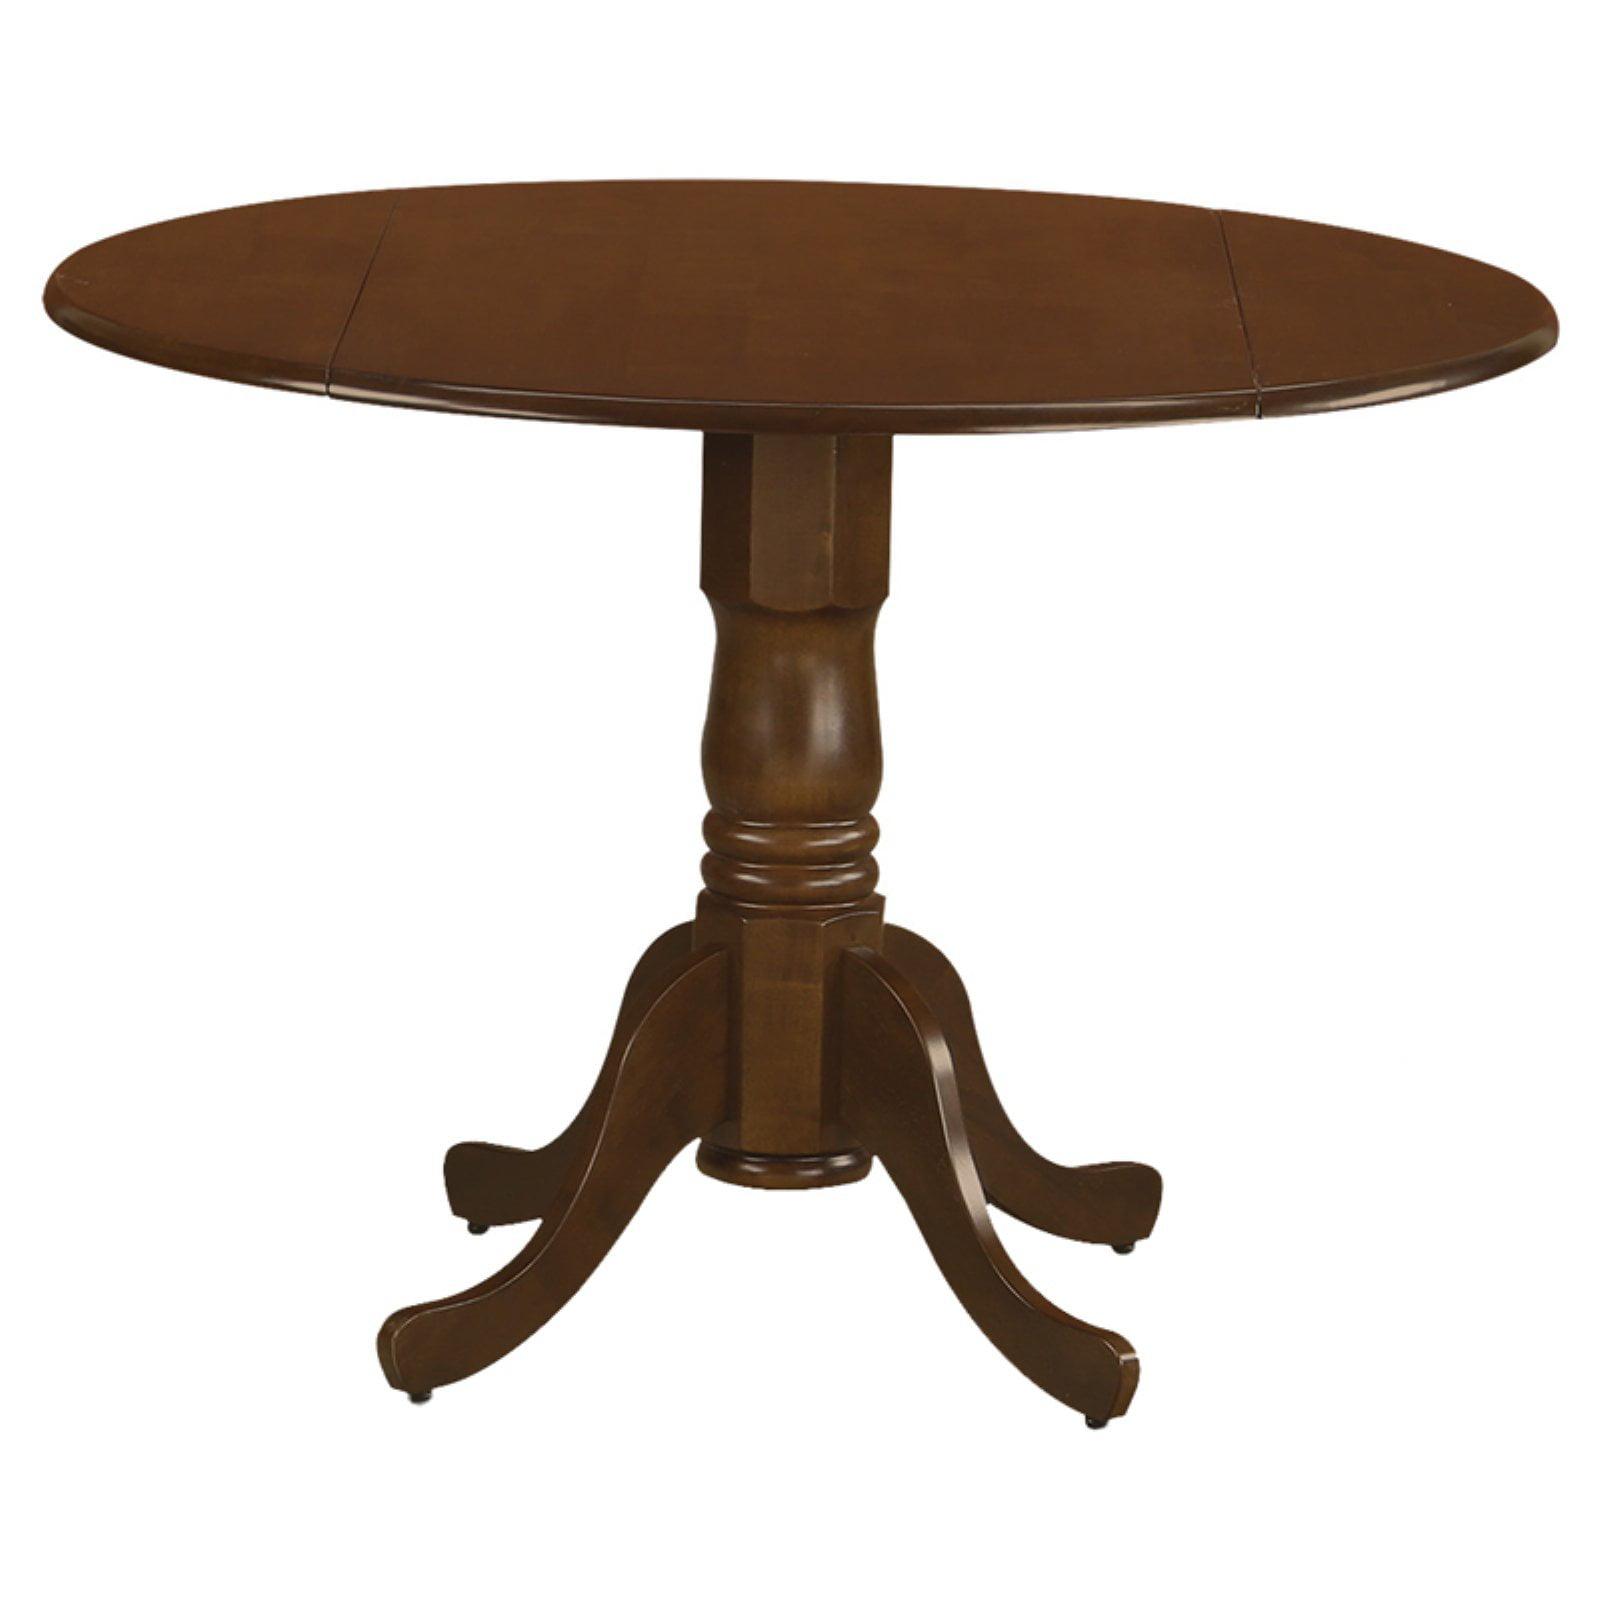 East West Furniture Dublin Round Pedestal Drop leaf Dining Table